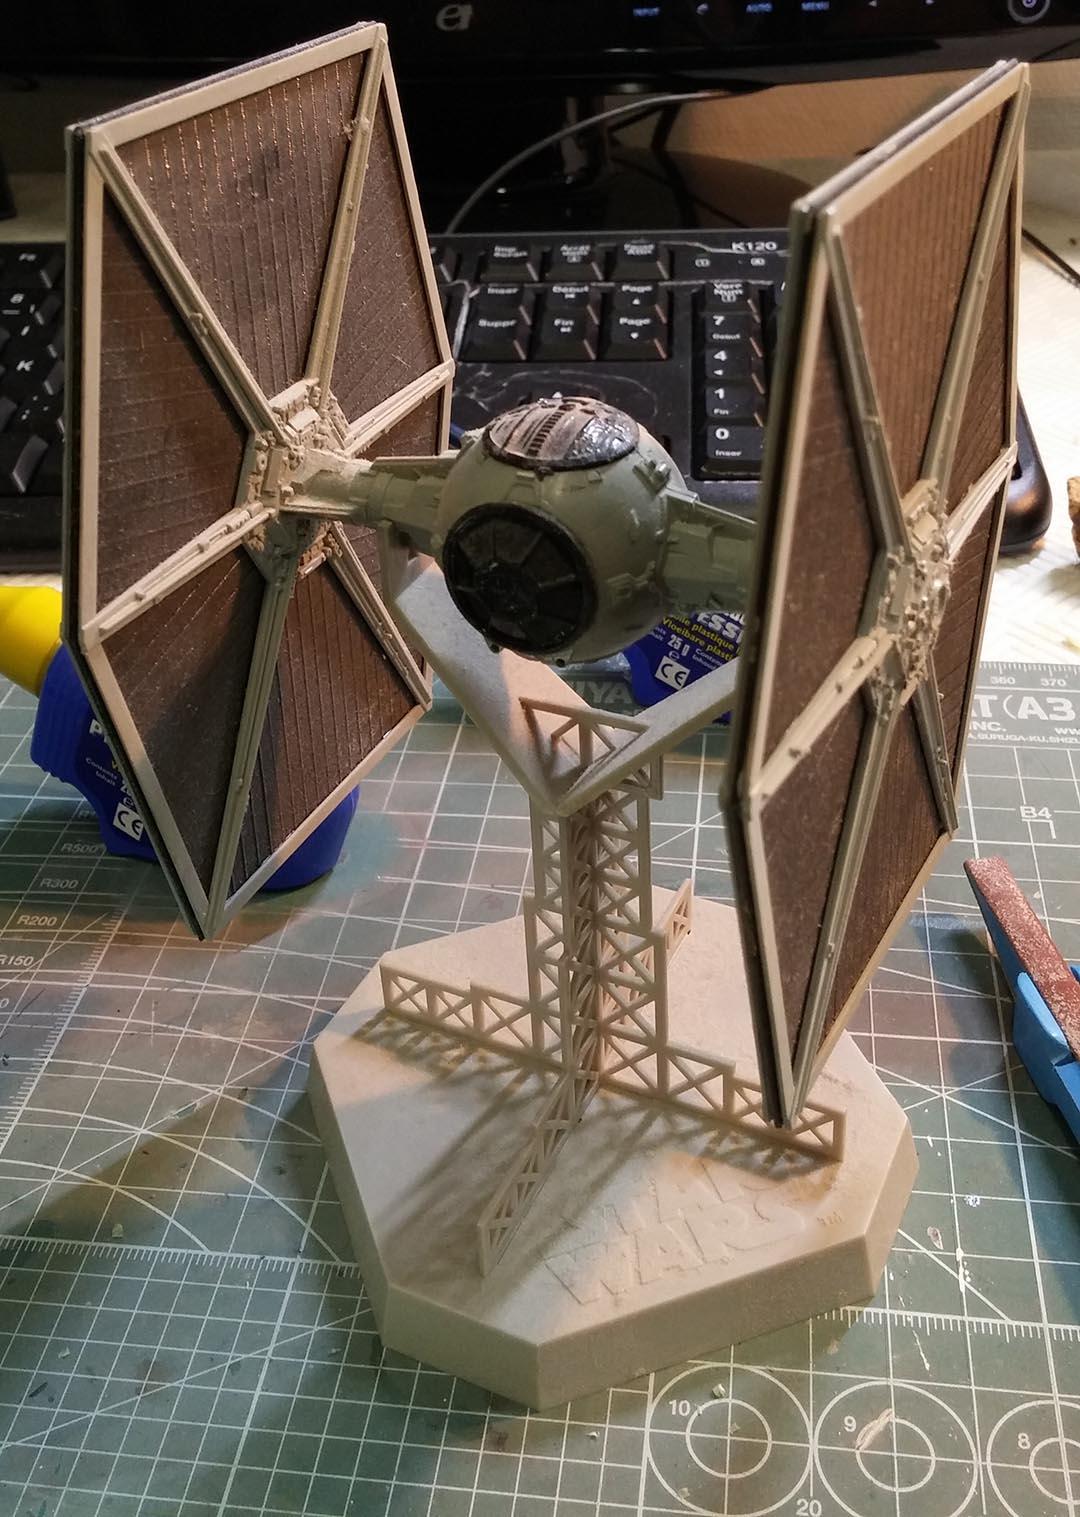 STAR WARS : chantiers spatial de rénovation 83243520141011142333